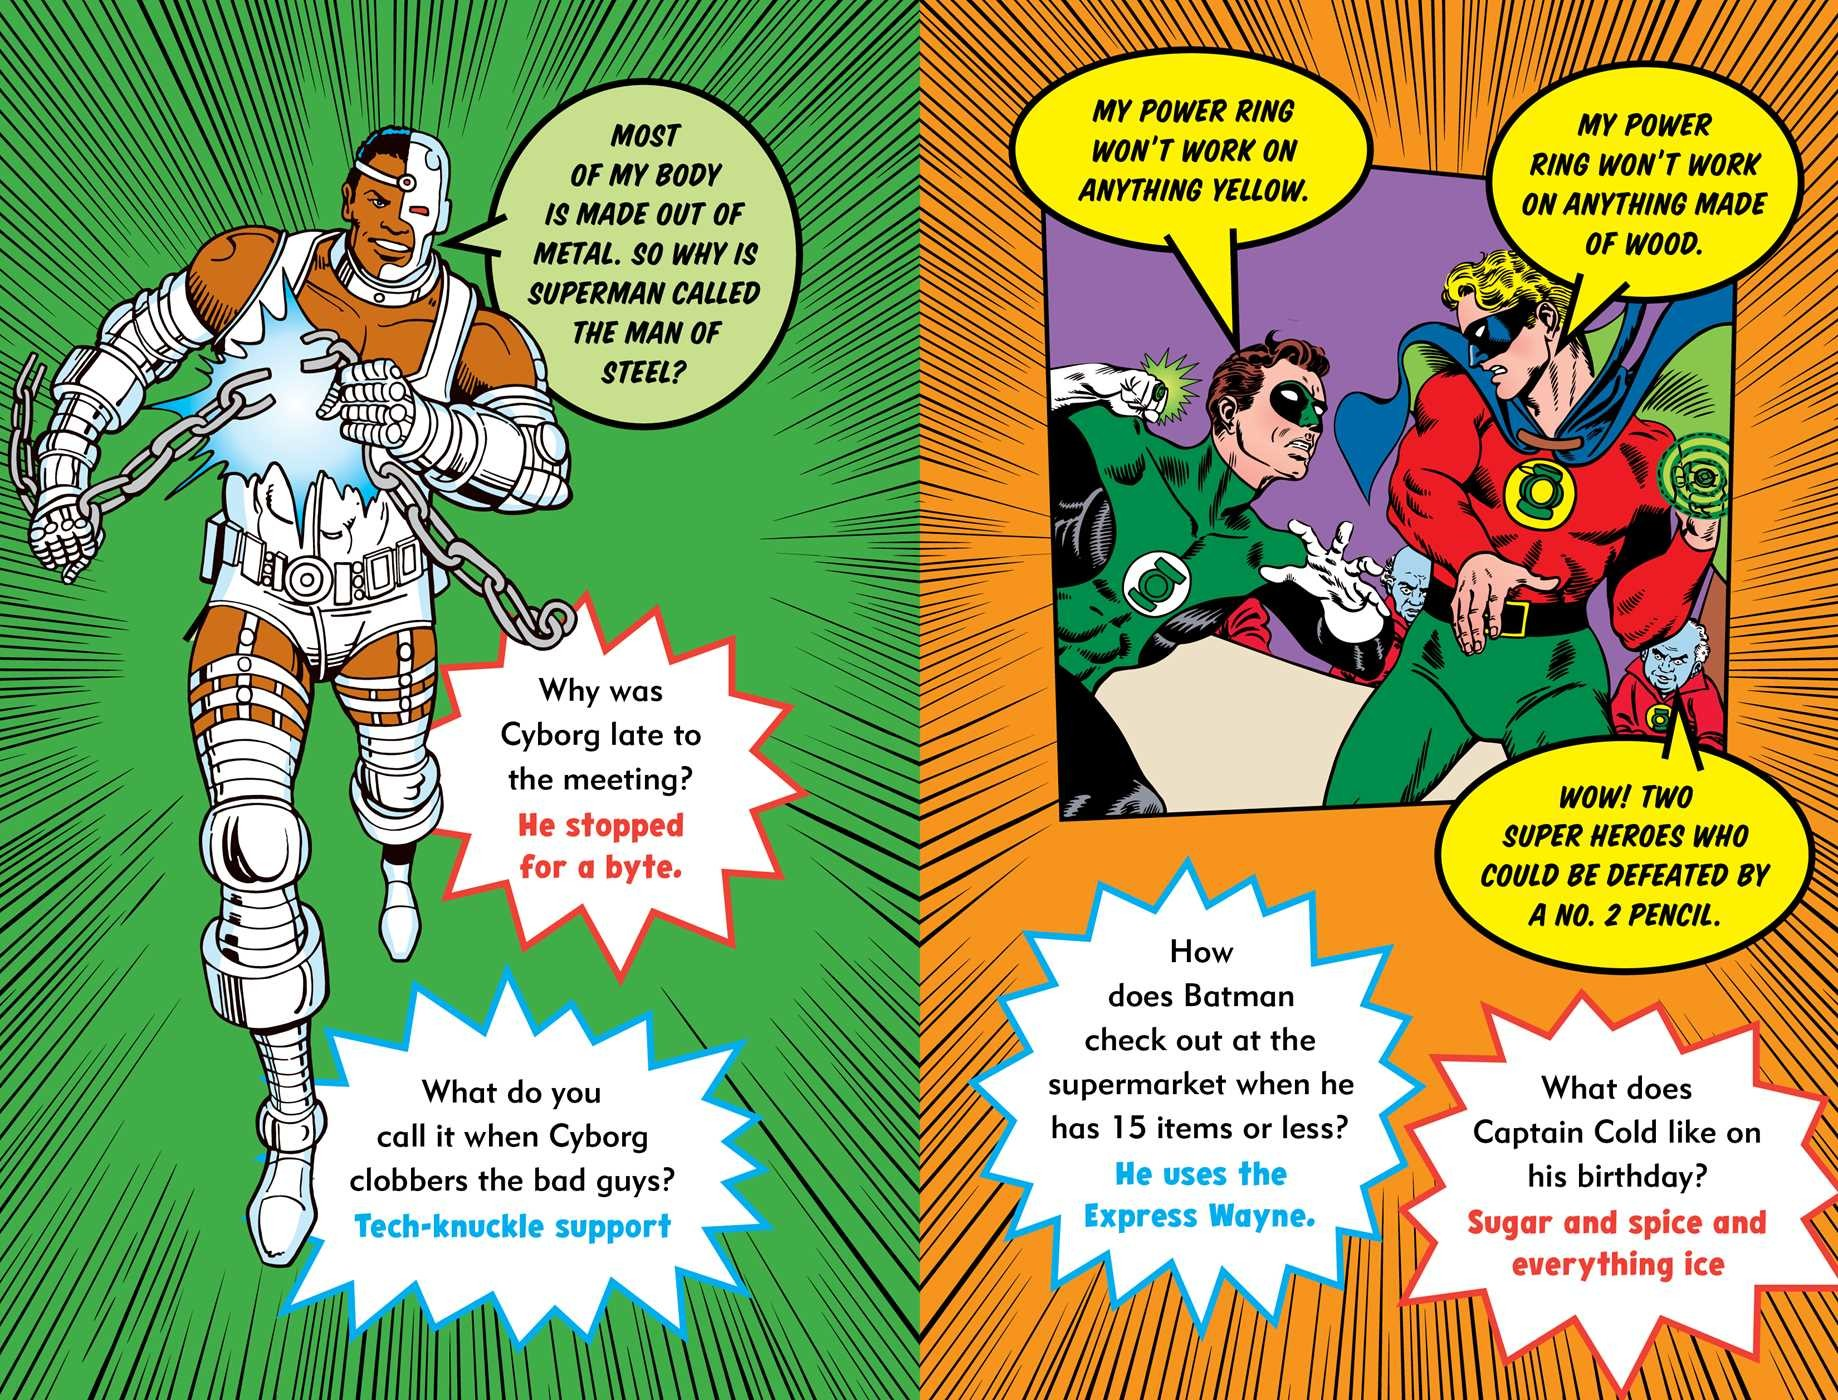 The official dc super hero joke book 9781941367339.in01